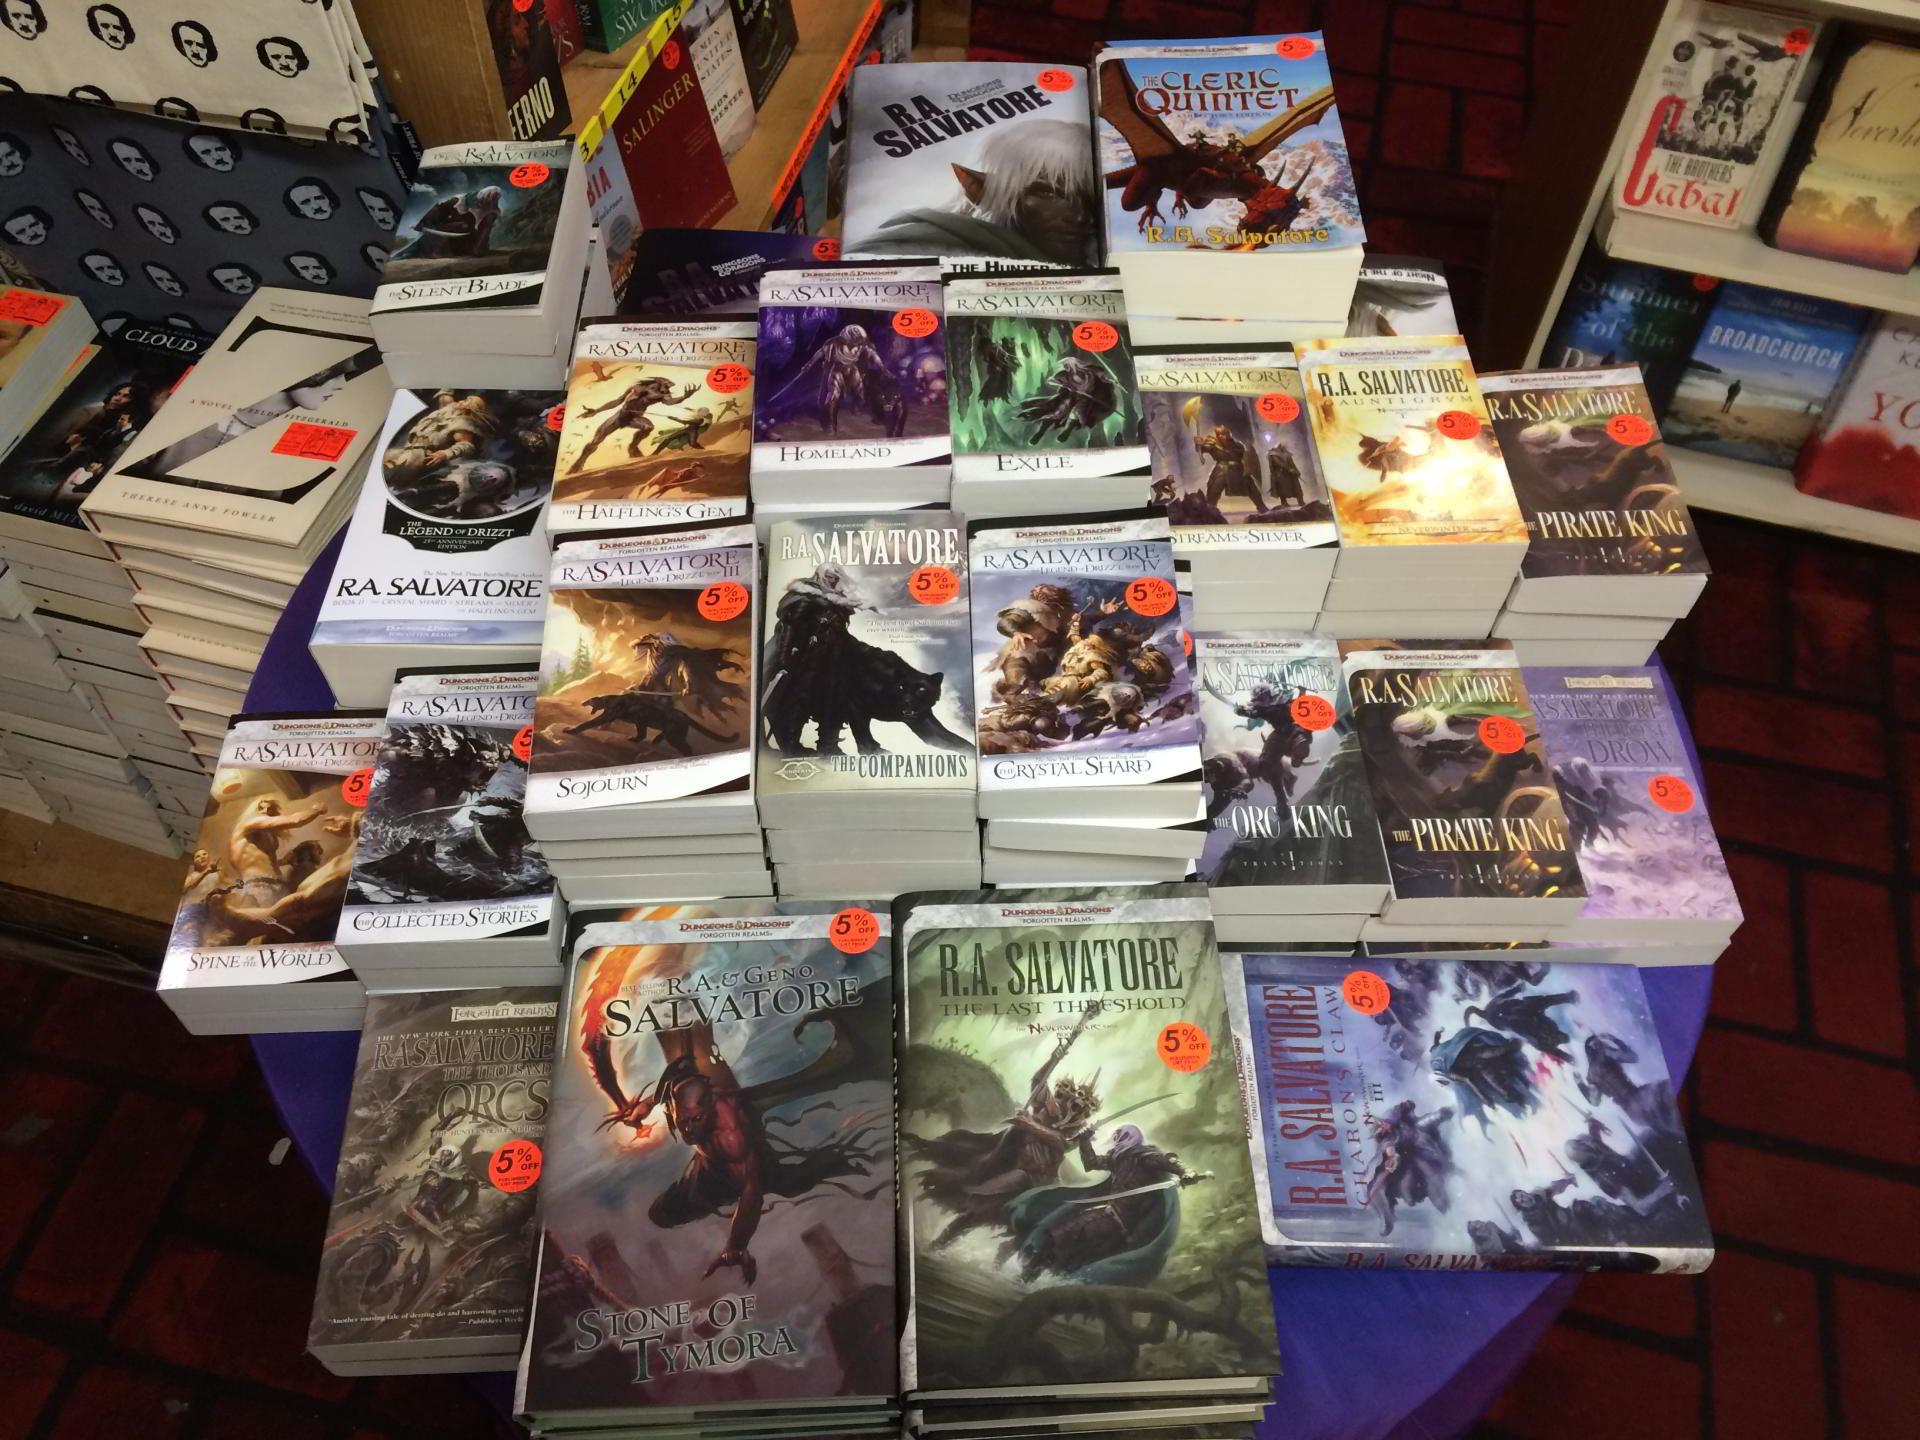 RA Salvatore's books